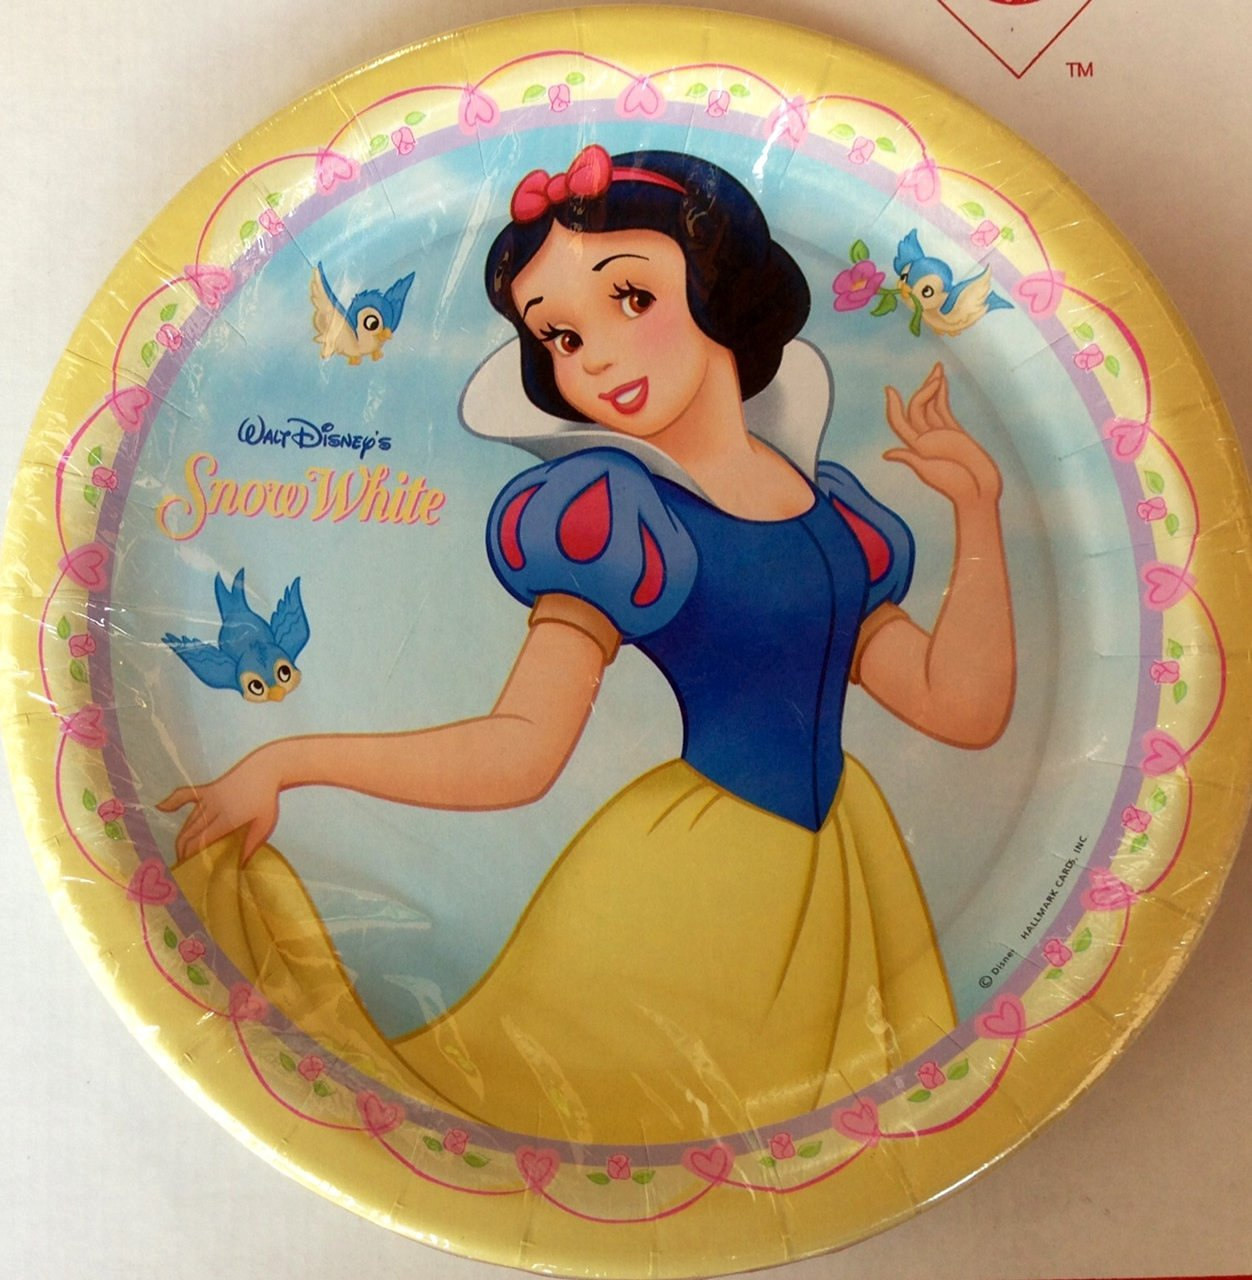 Disney Princess Beautiful Snow White Party Plates - 8ct Dinner Plates